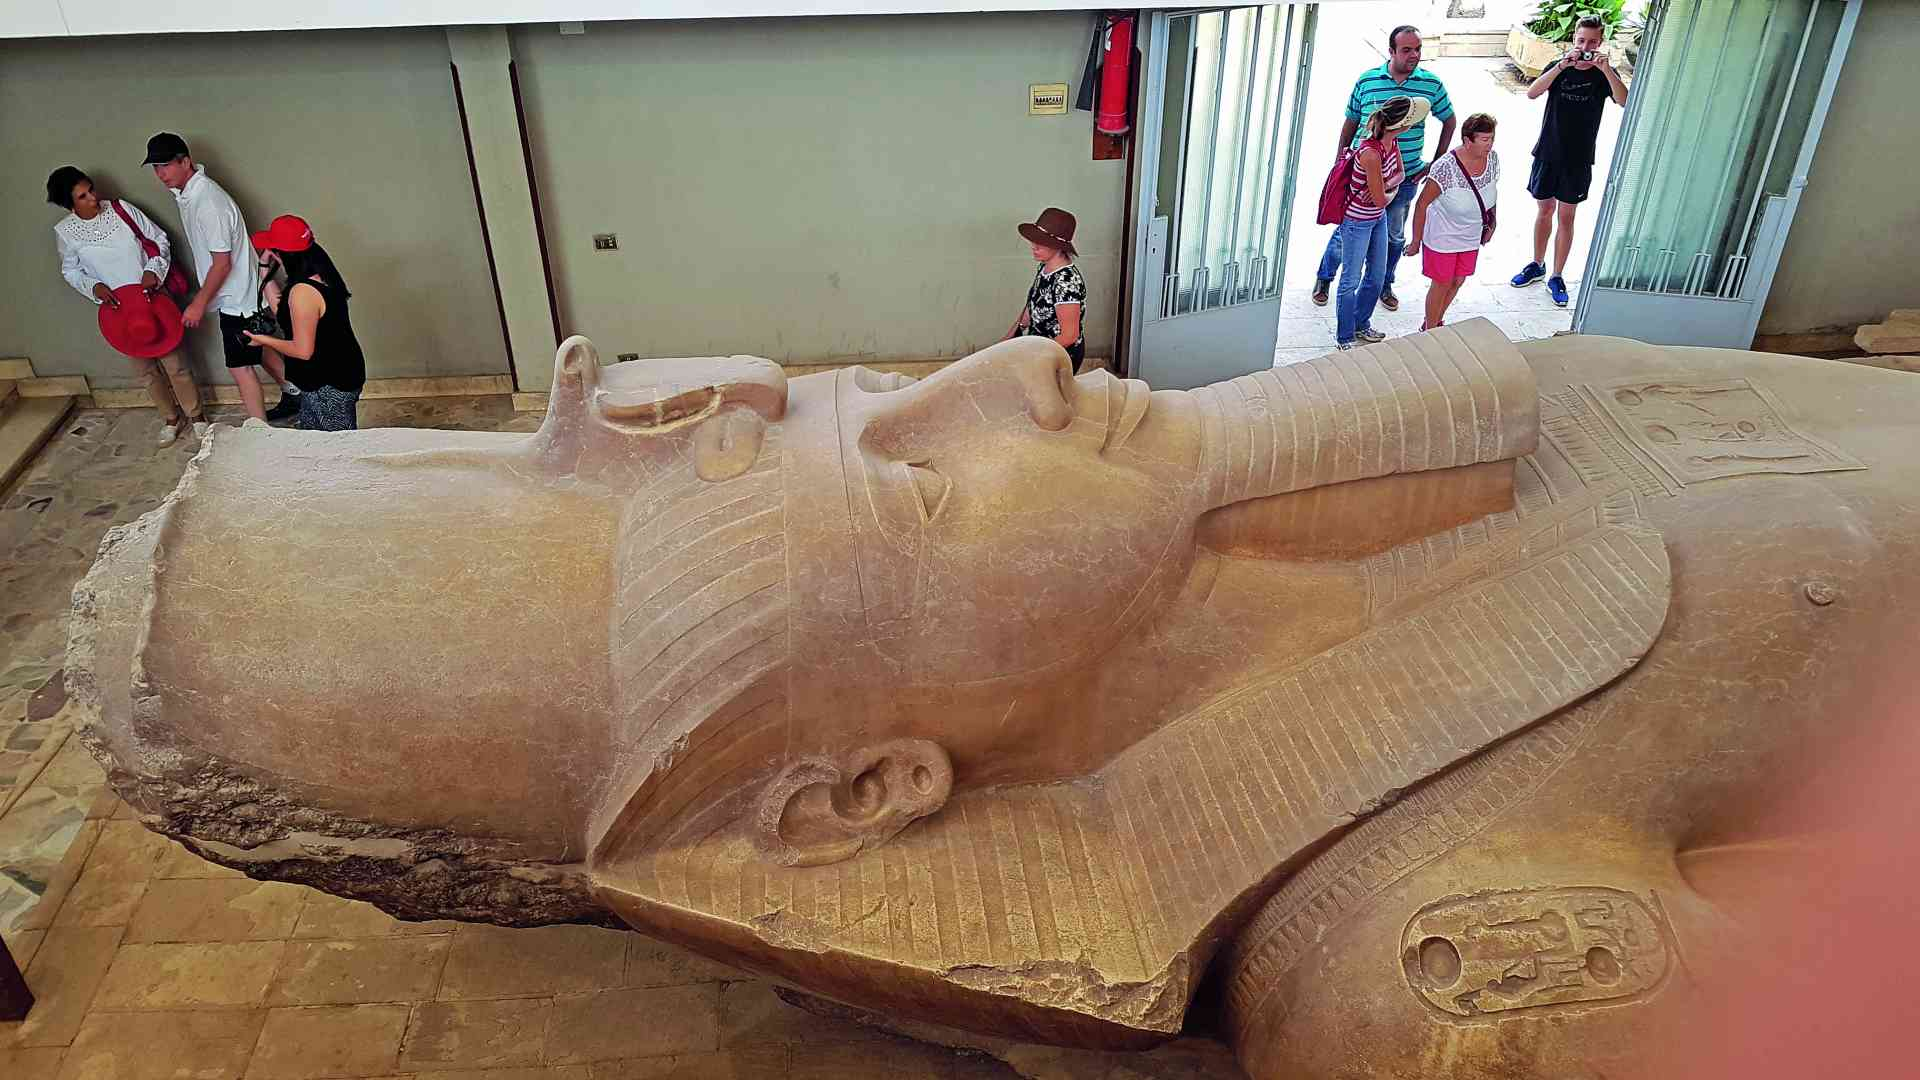 Statue of Ramses II, Memphis, Egypt by Dennis Bunnik